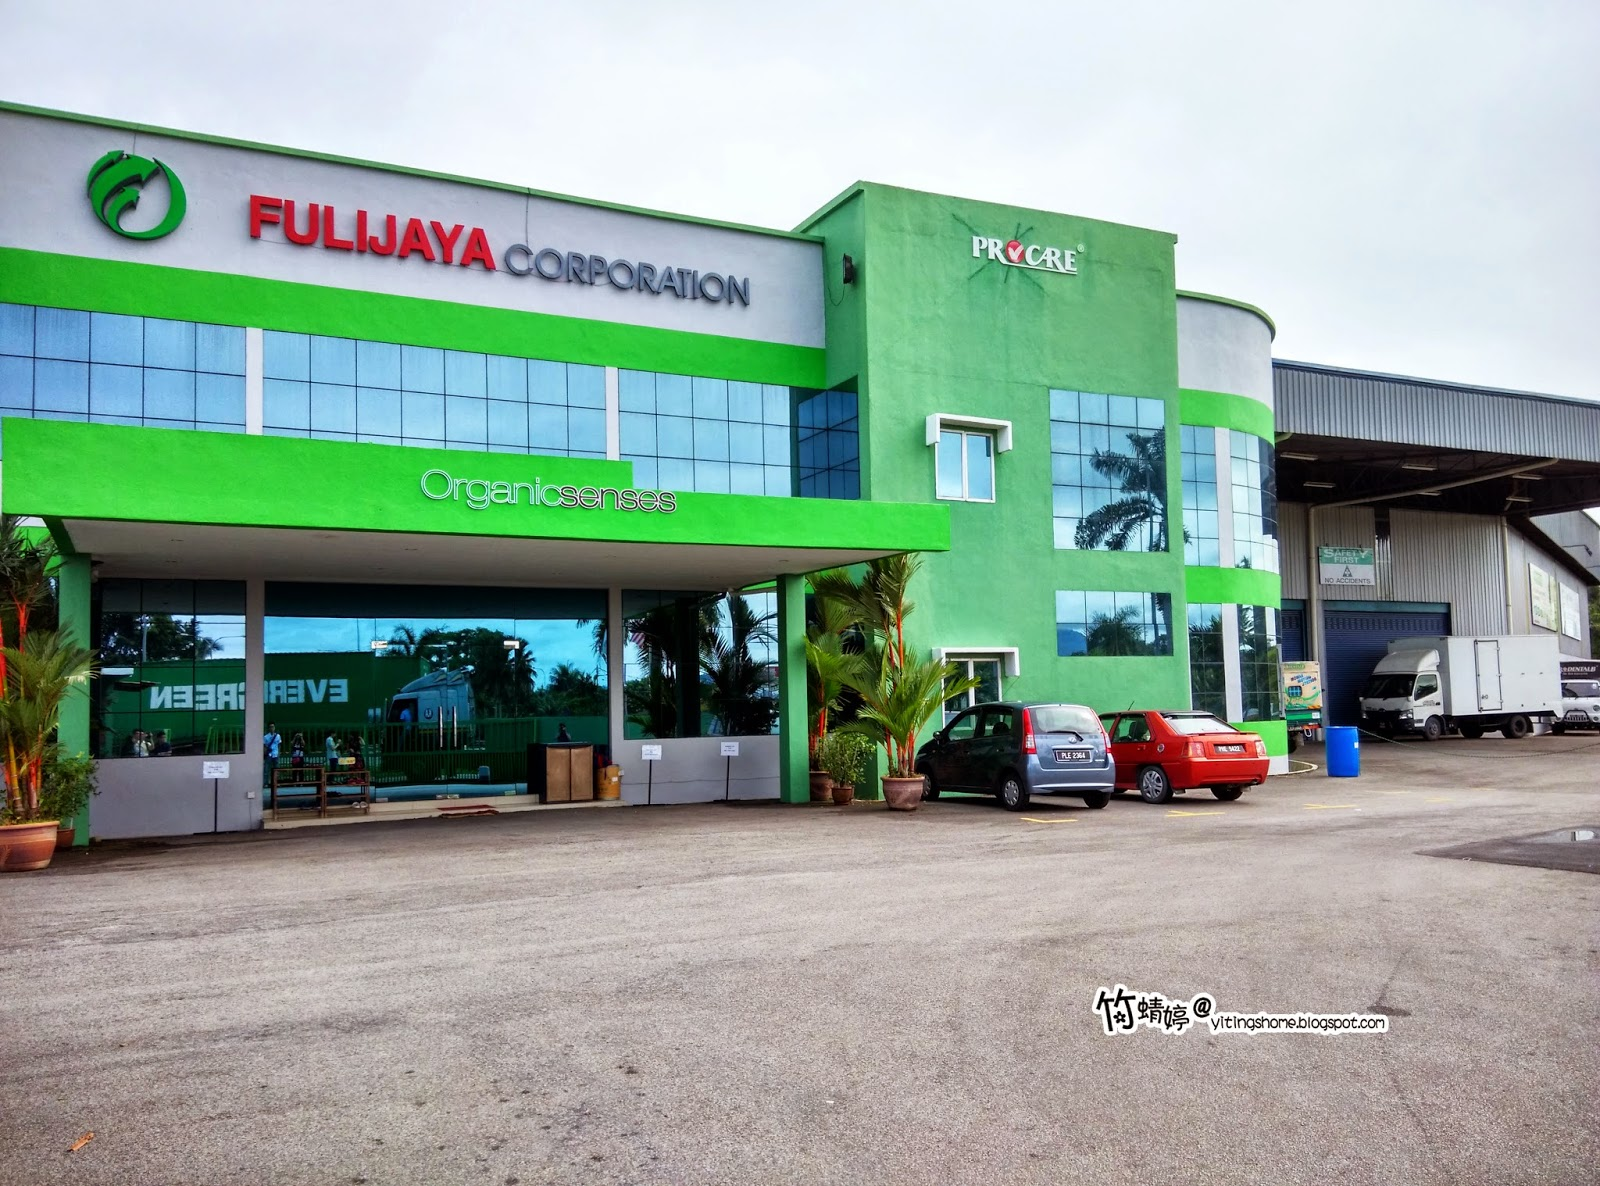 Fulijaya